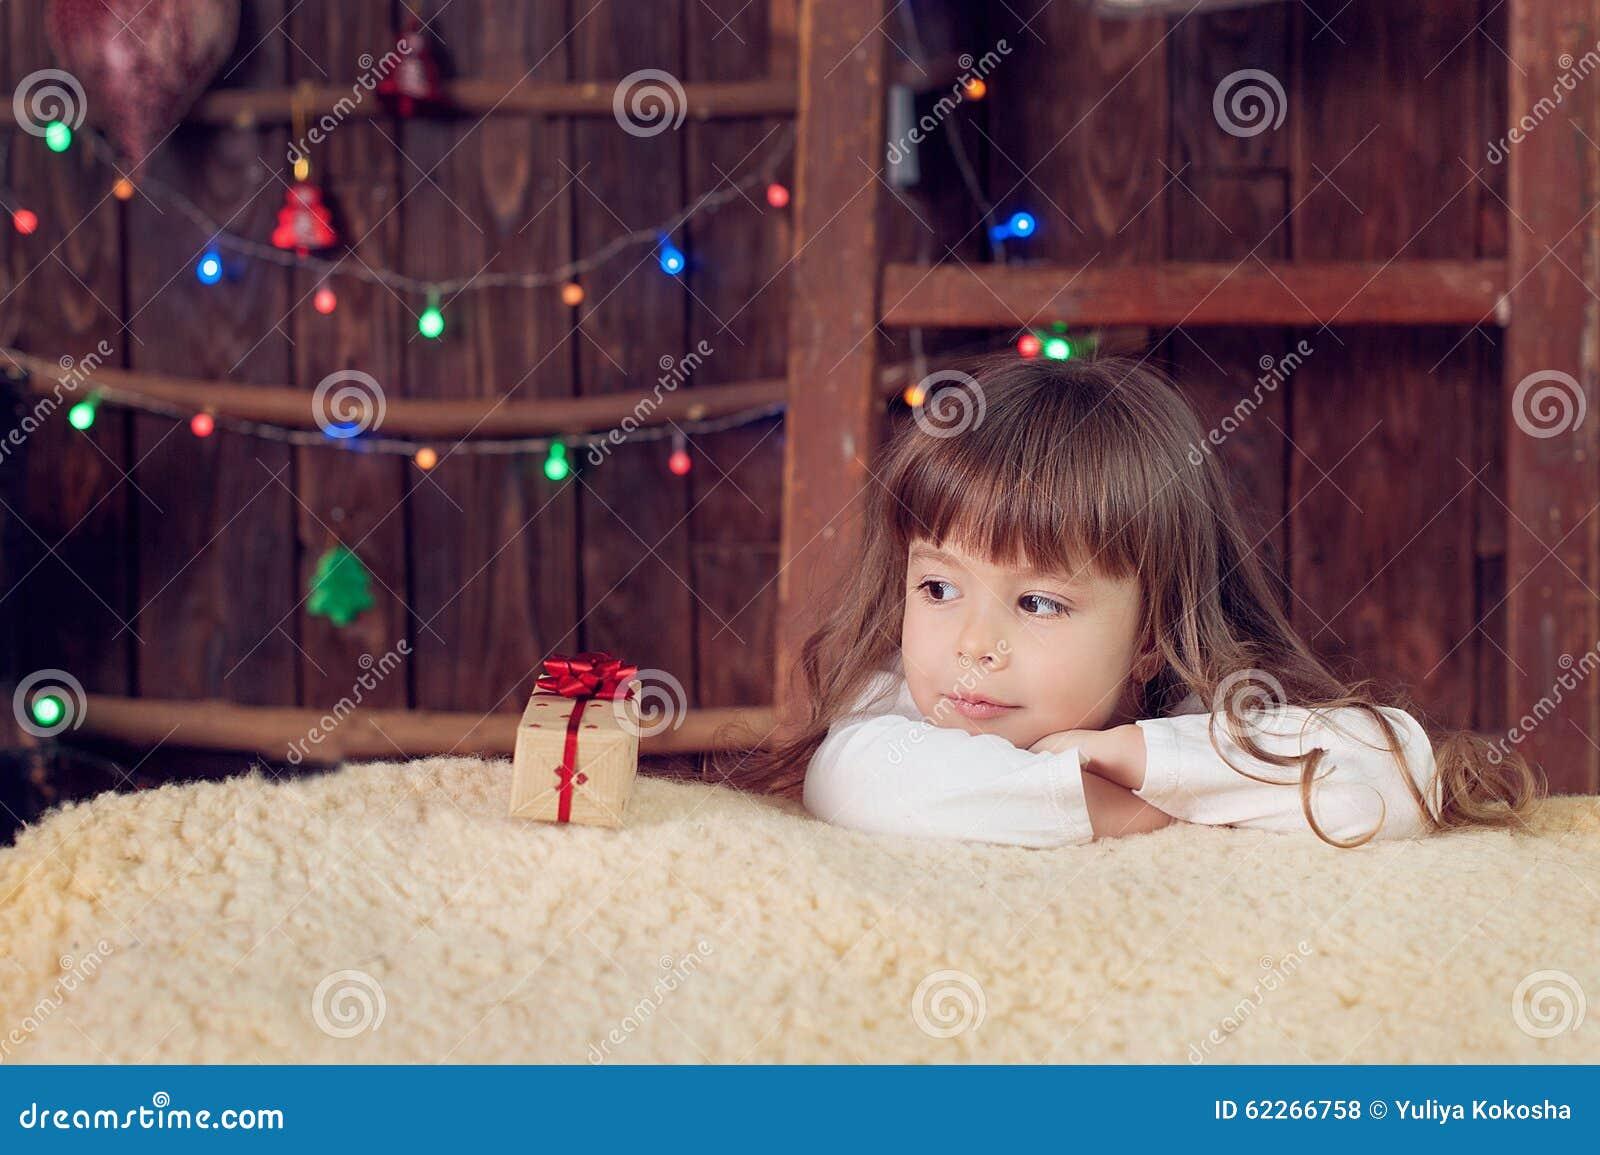 Little Girl Under The Tree On Christmas Stock Photo